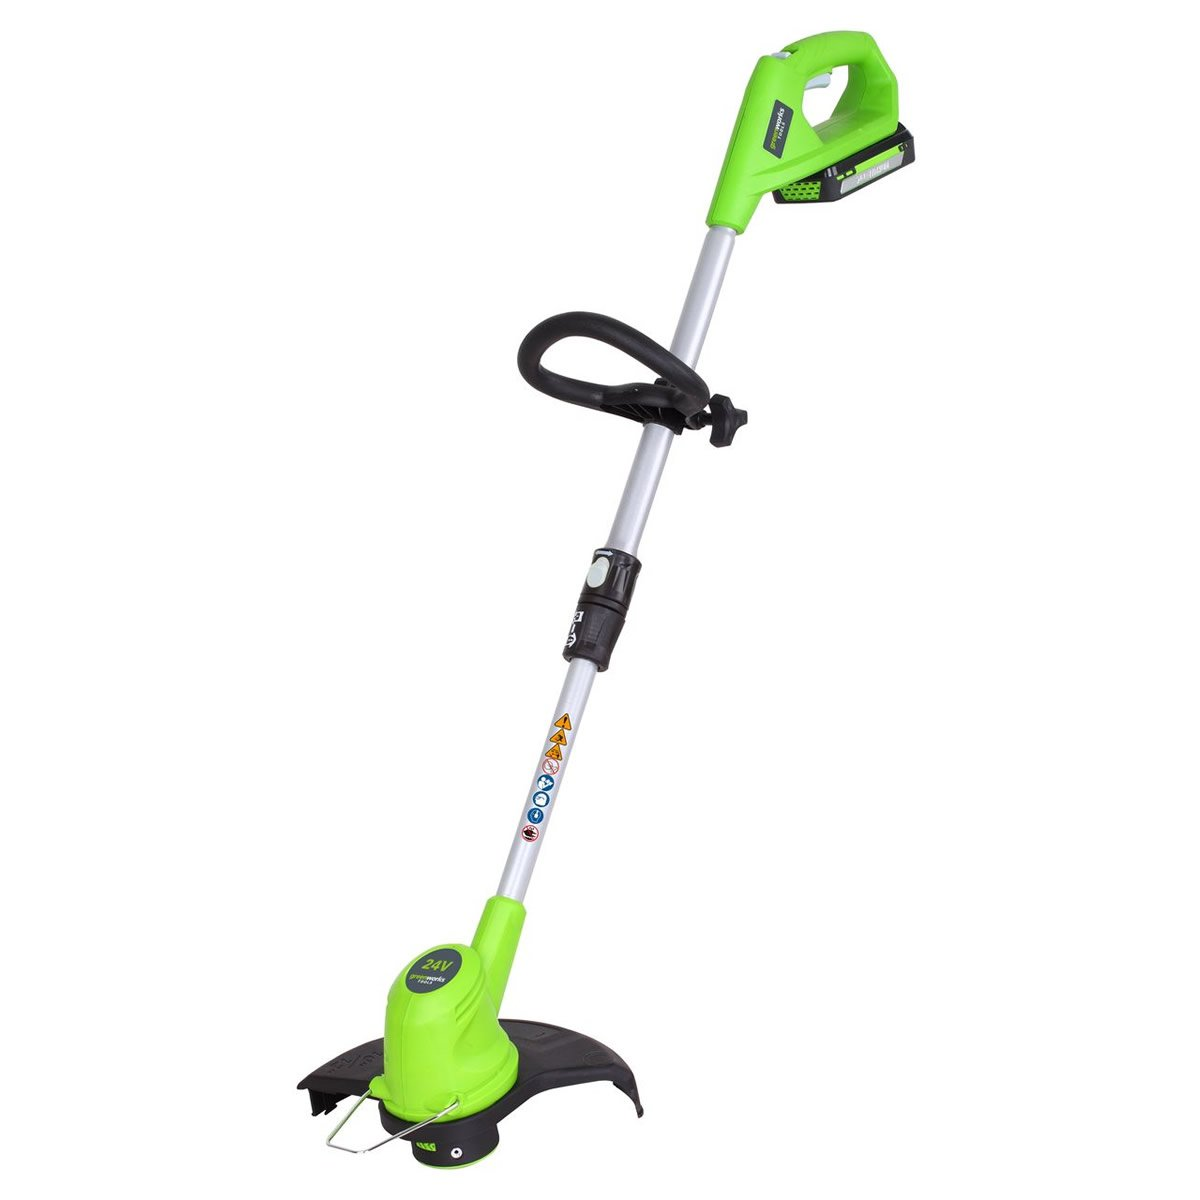 Greenworks 24v Cordless Trimmer/Edger (21247)